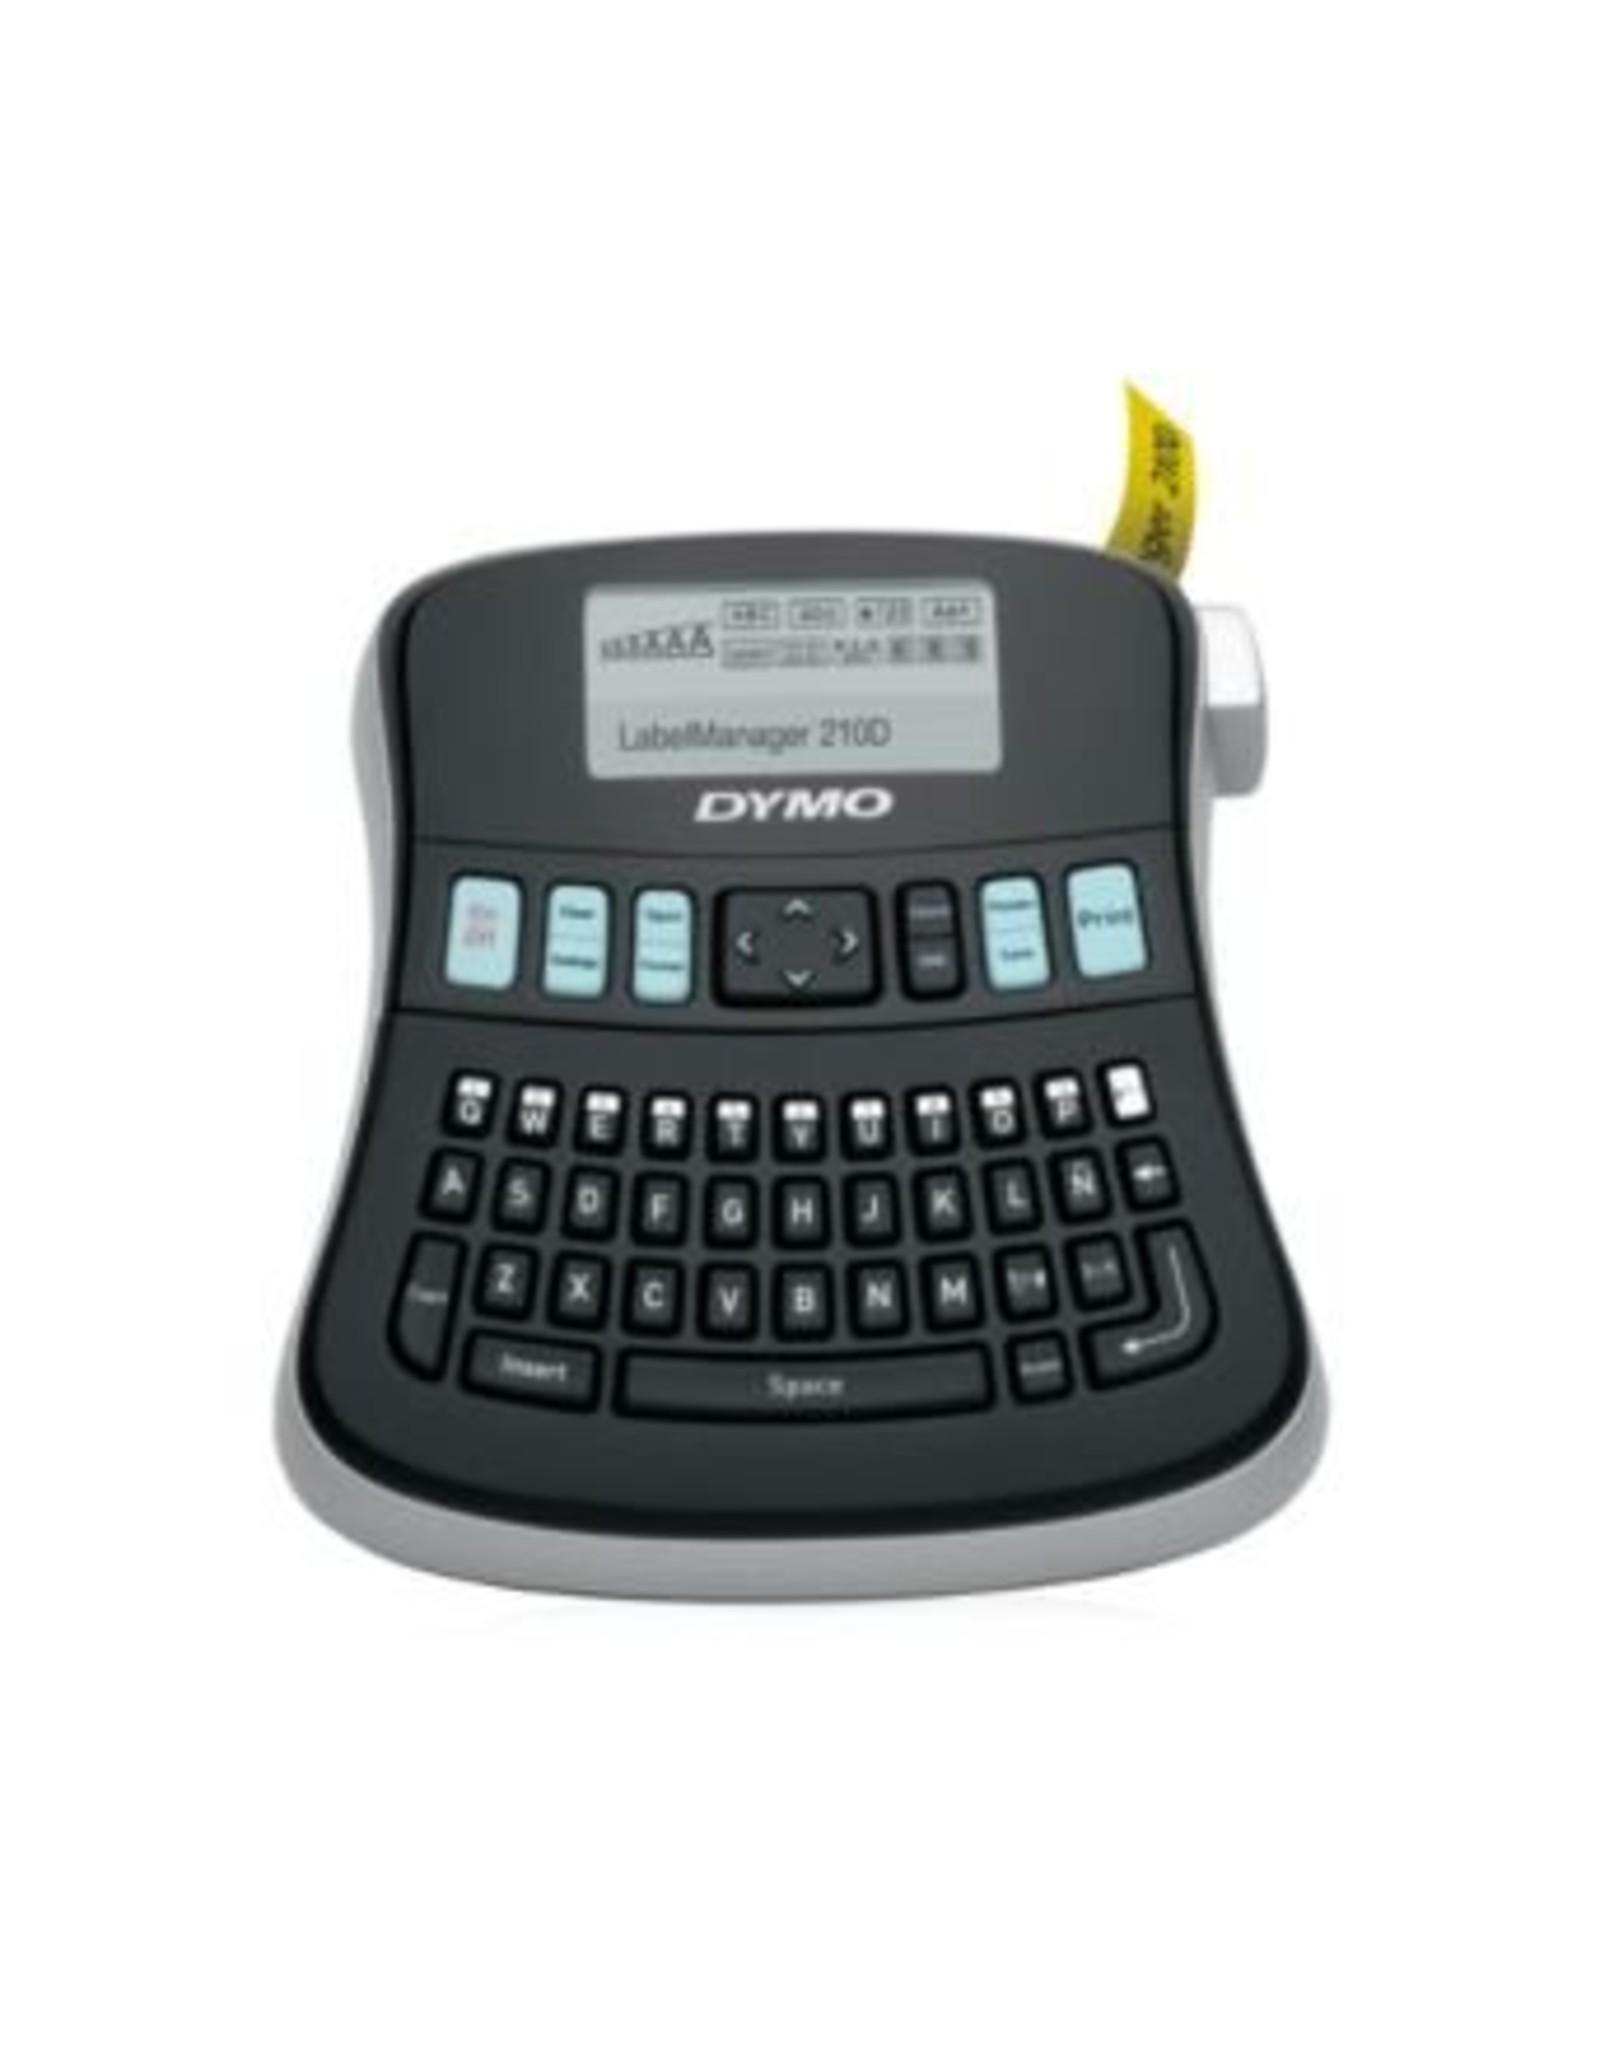 DYMO DYMO 210D labelprinter